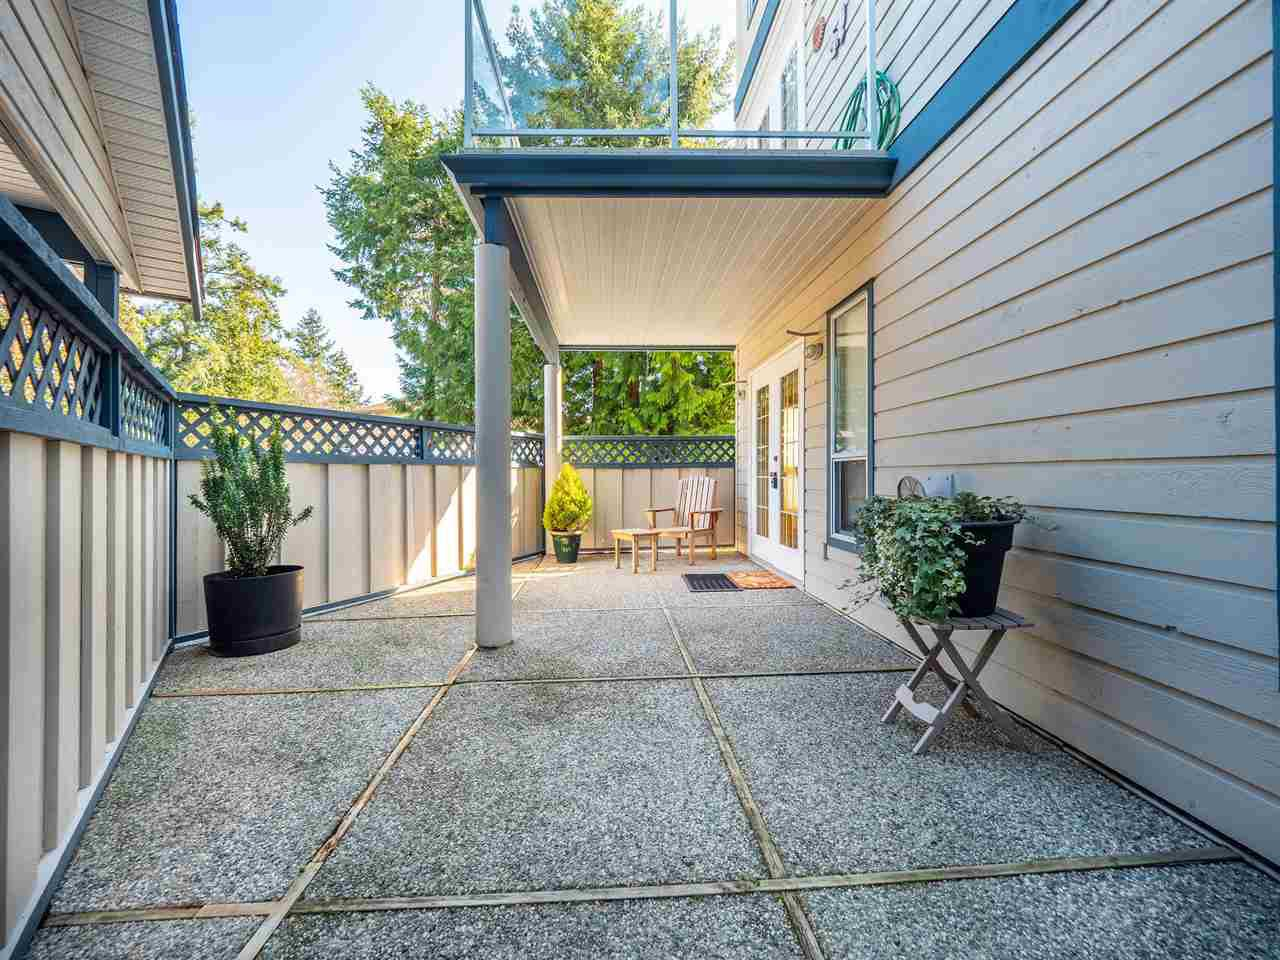 "Photo 2: Photos: 105 5768 MARINE Way in Sechelt: Sechelt District Condo for sale in ""Cypress Ridge"" (Sunshine Coast)  : MLS®# R2446337"